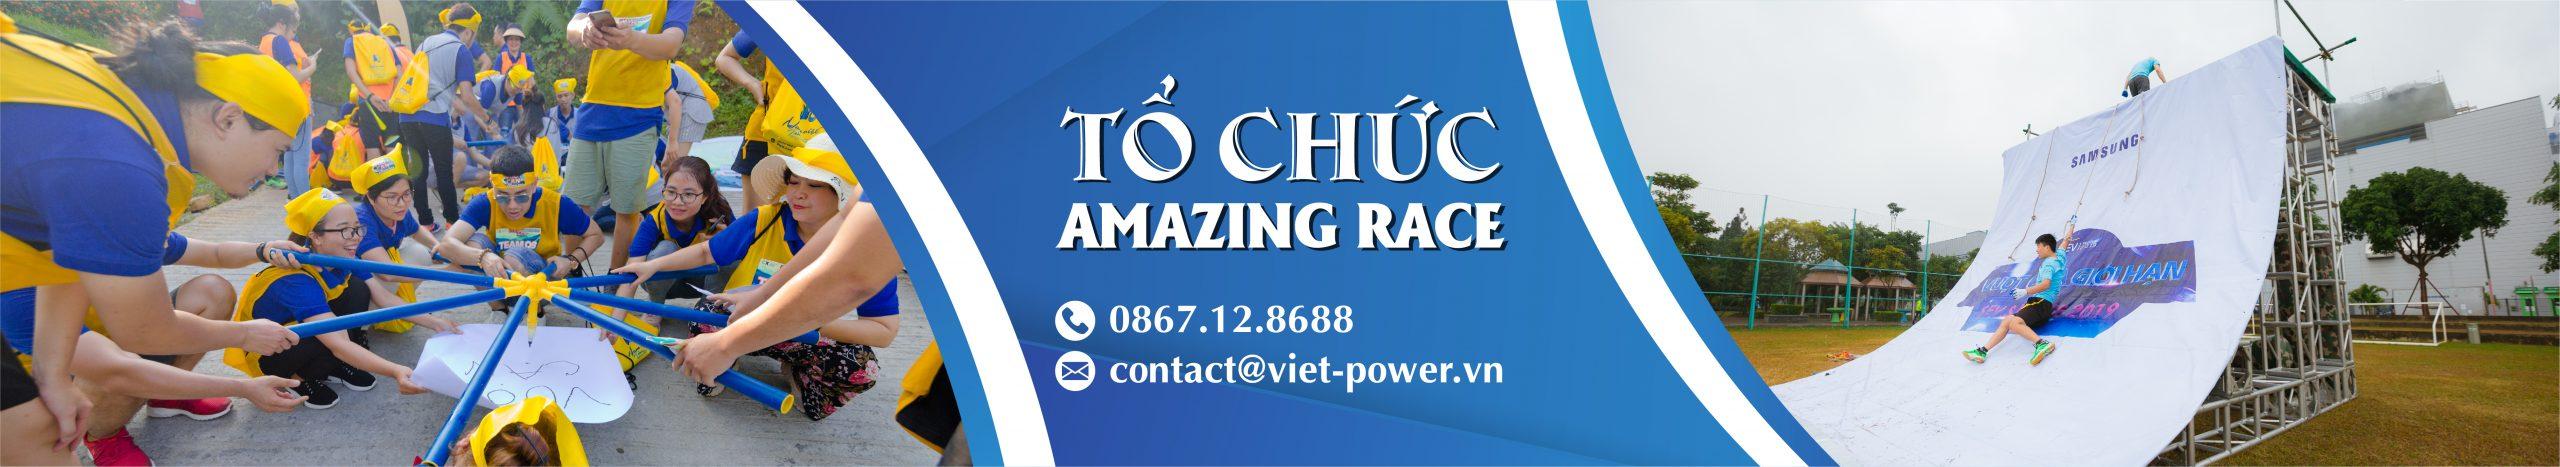 tổ chức amazing race